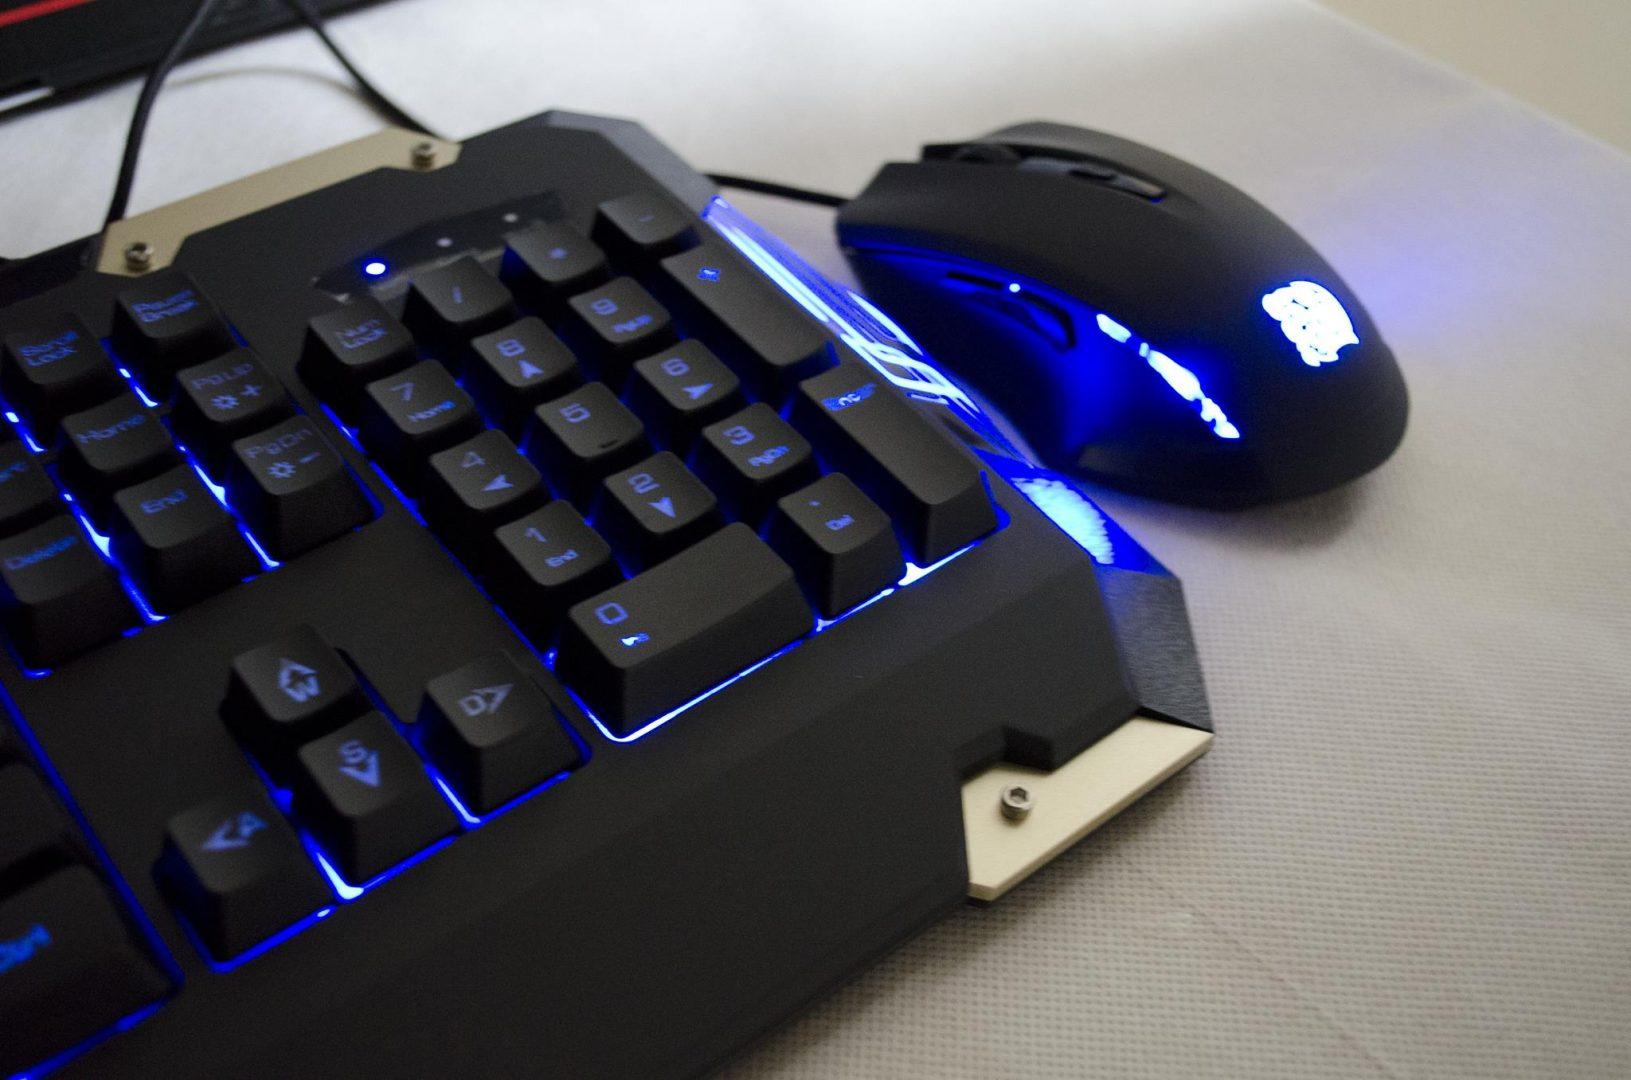 Tt eSPORTS Commander Gaming Gear Combo Review Photos_20